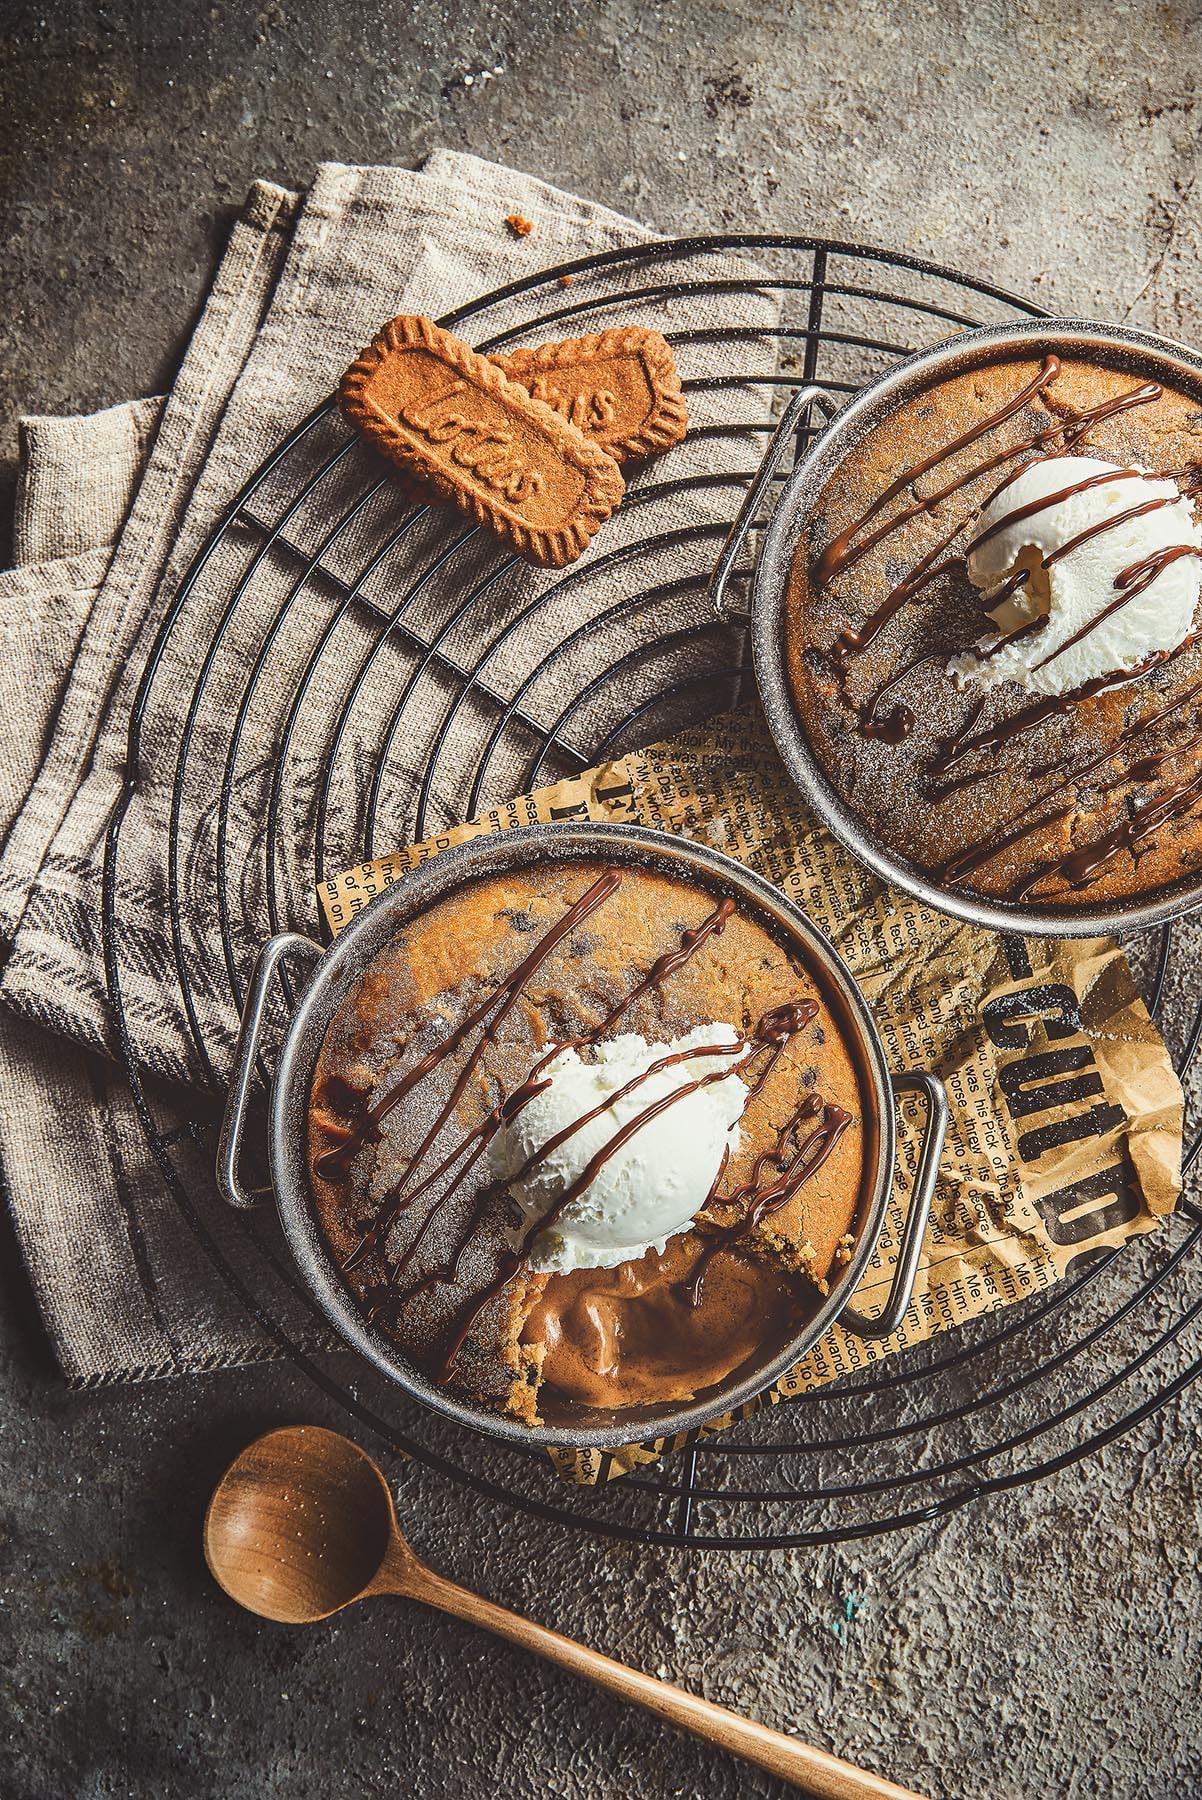 Lotus Molten Cake - Food photographer - Egypt - Mohamed Abdel-Hady